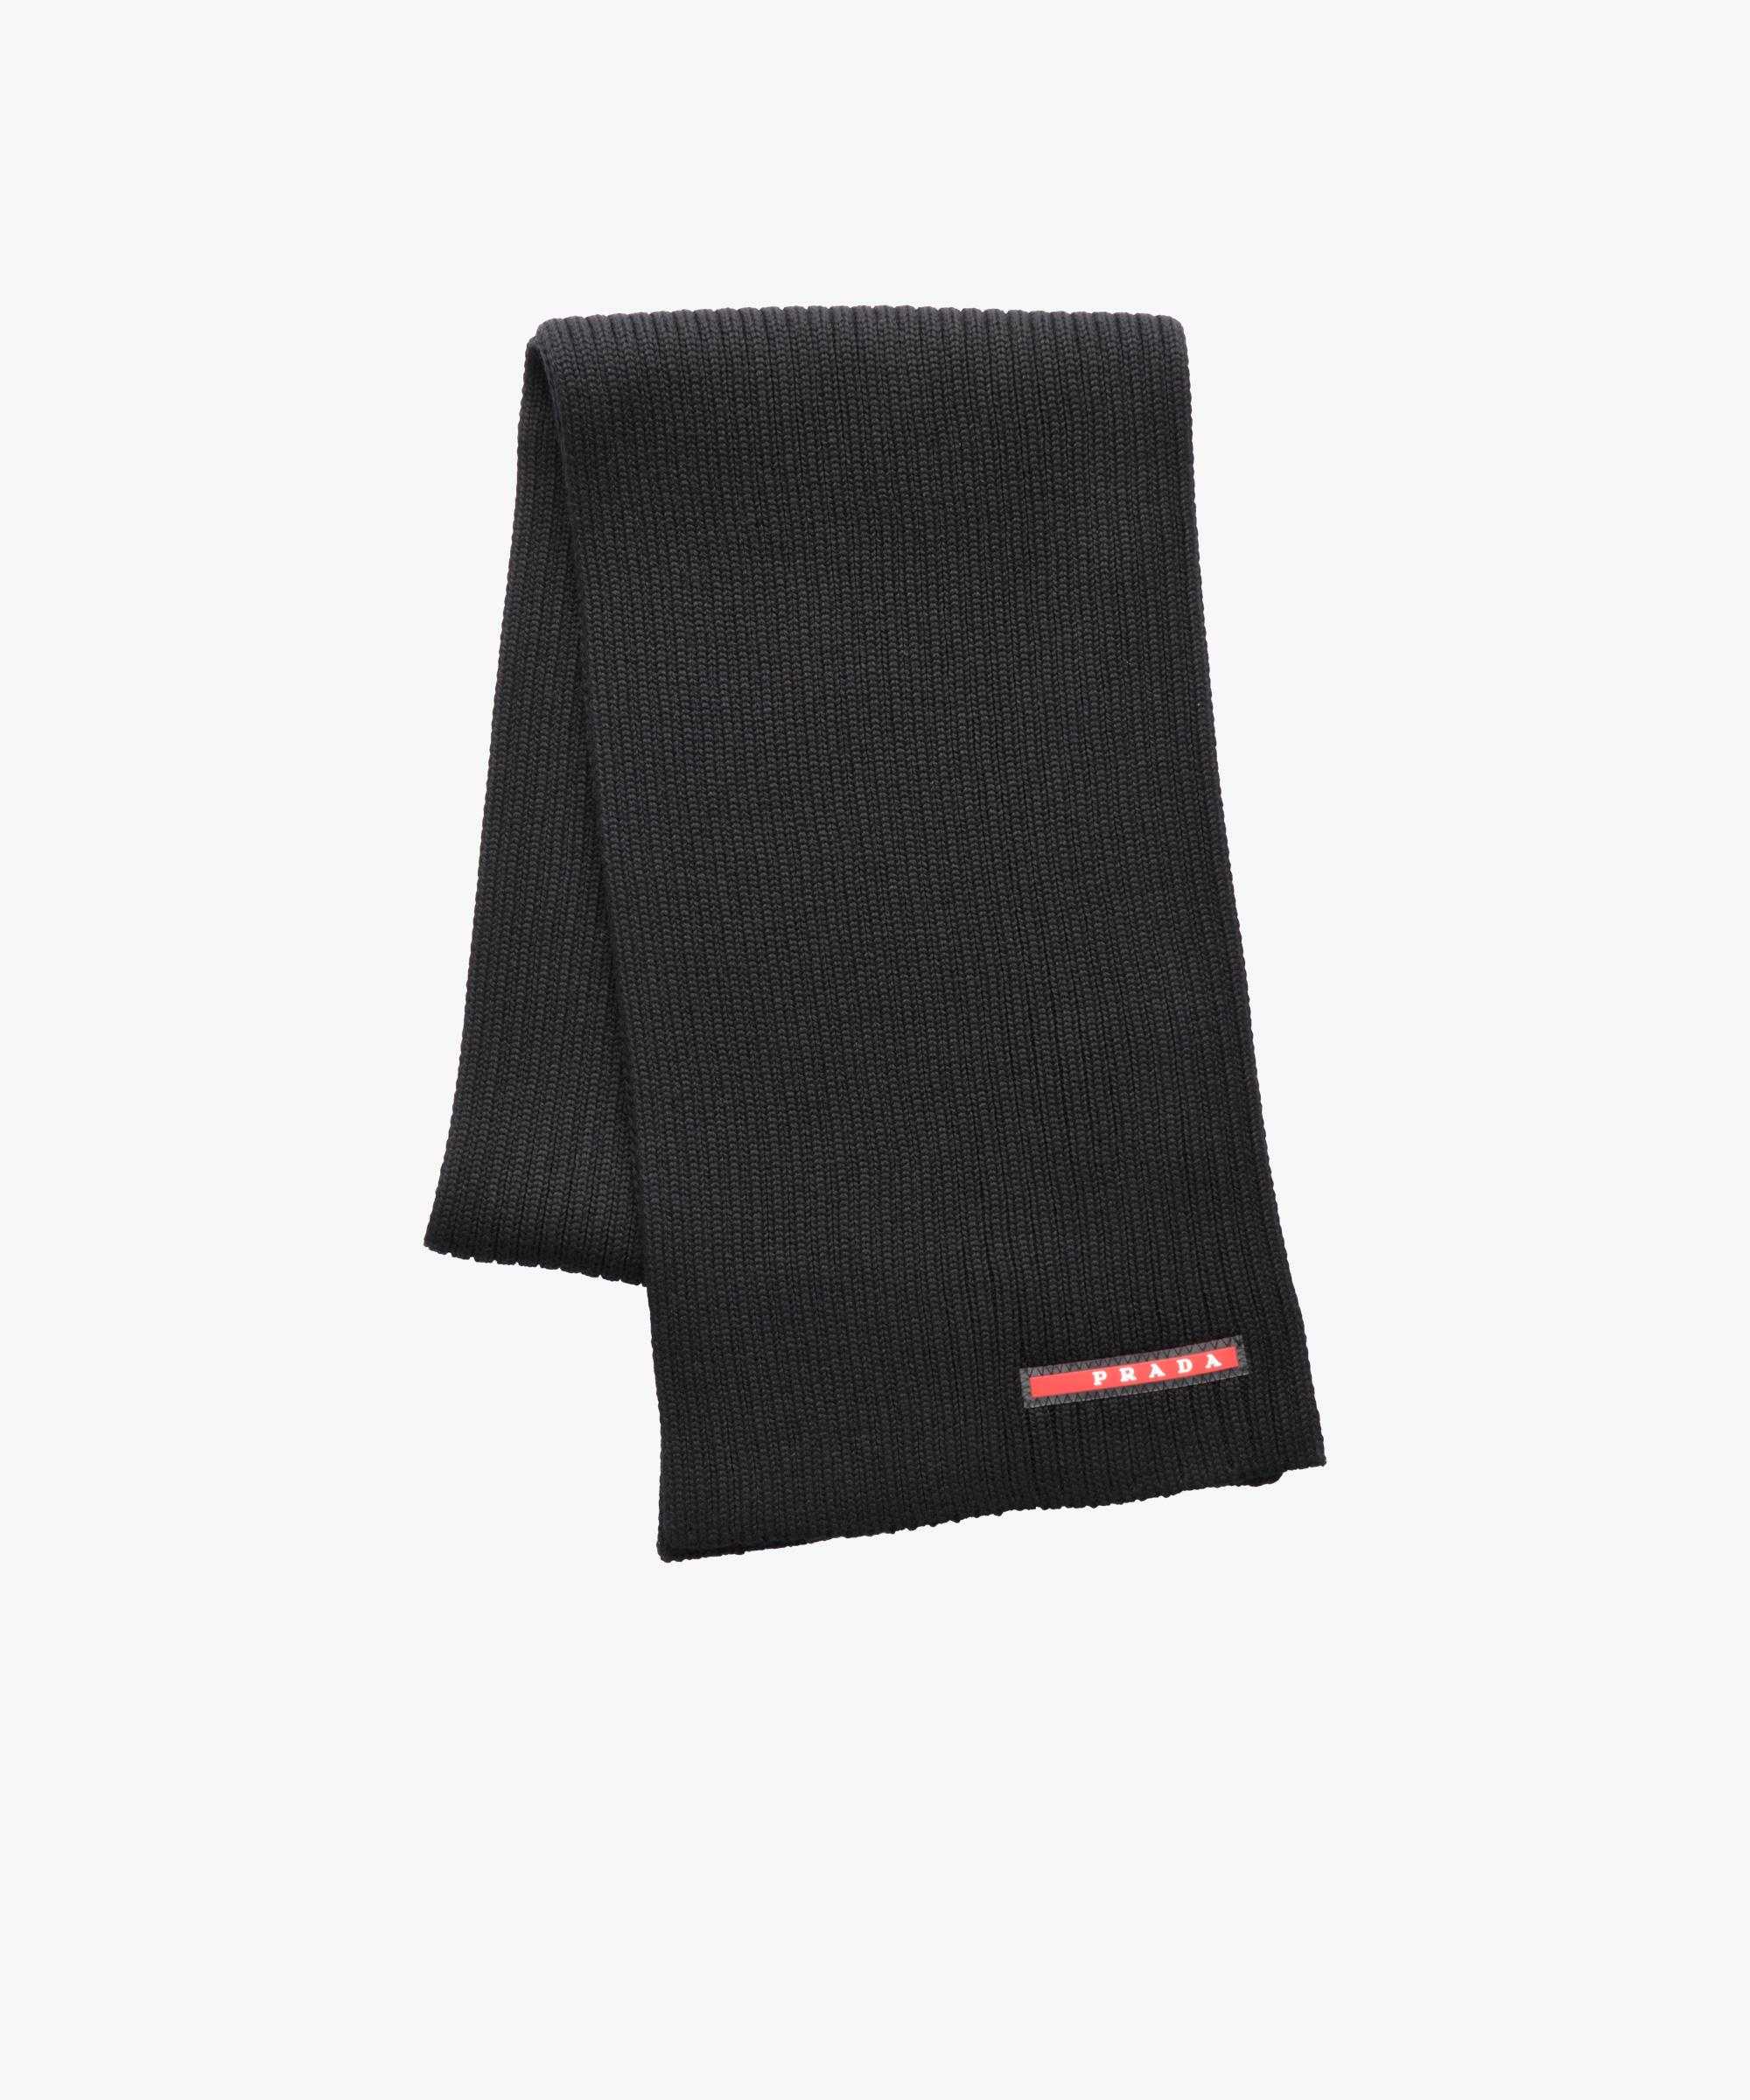 55e91ea4a37 ... wholesale lyst prada ribbed wool scarf in black for men c1da4 27a52